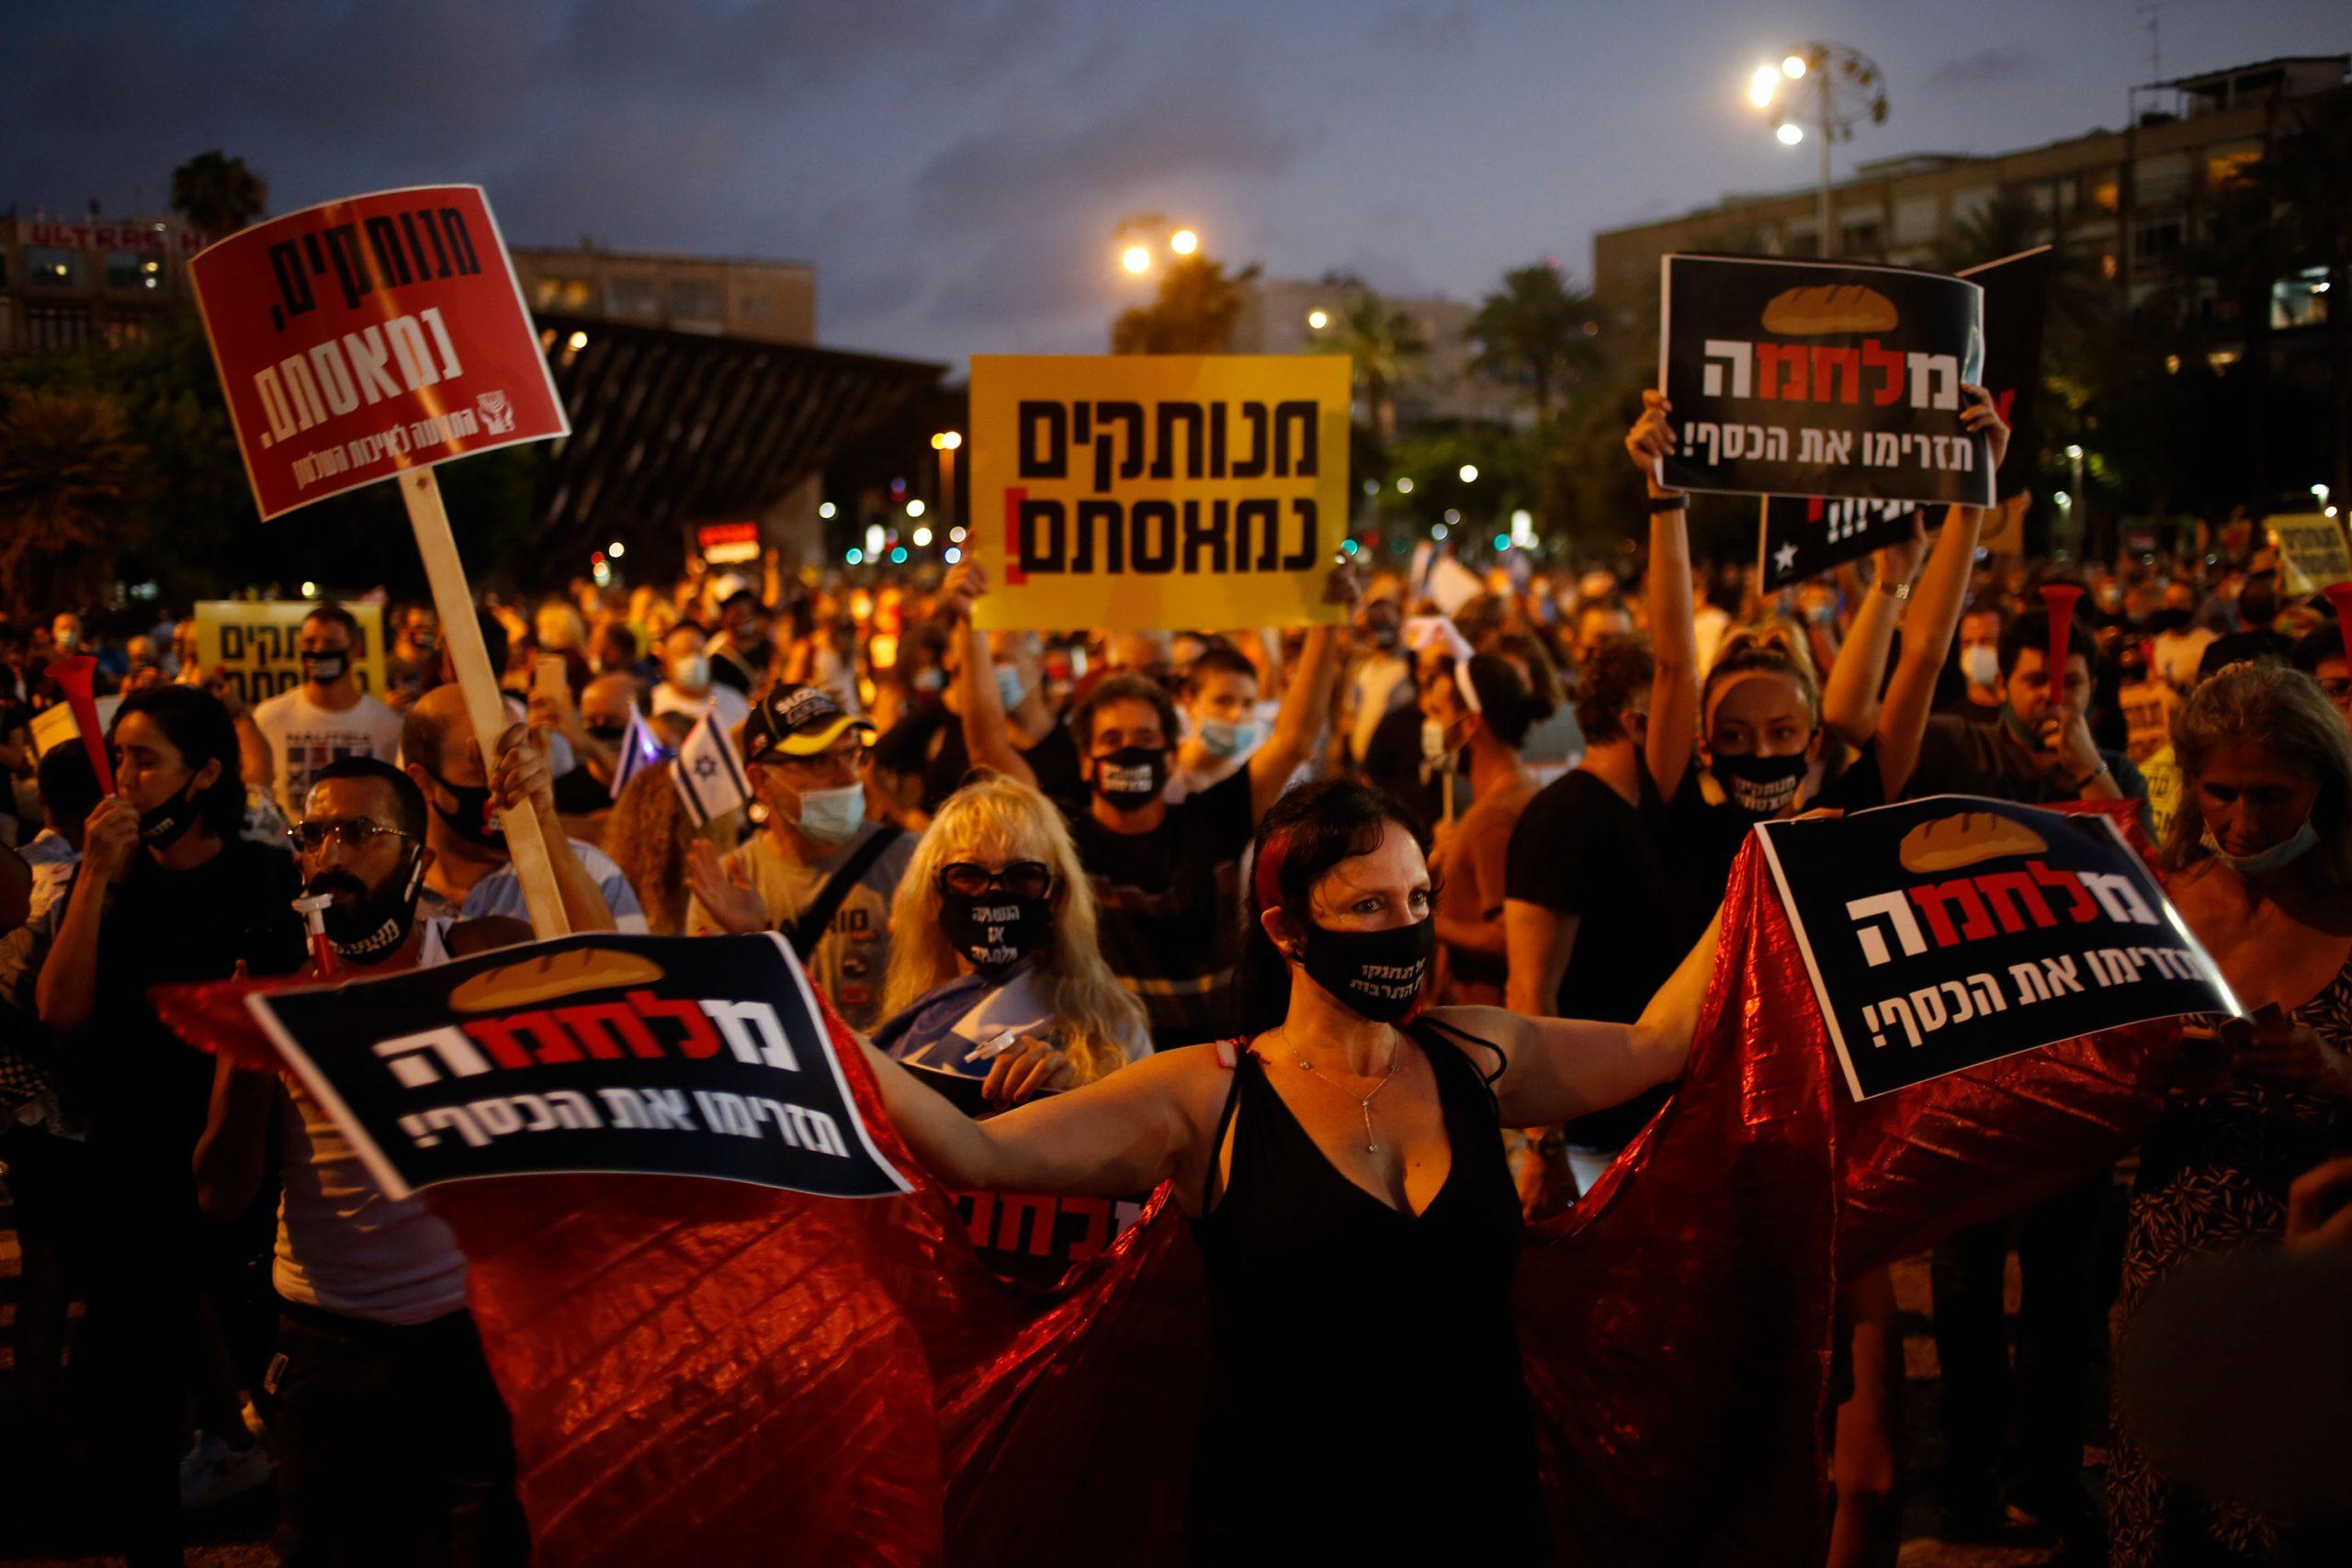 Ribuan orang memprotes penanganan virus corona di Tel Aviv